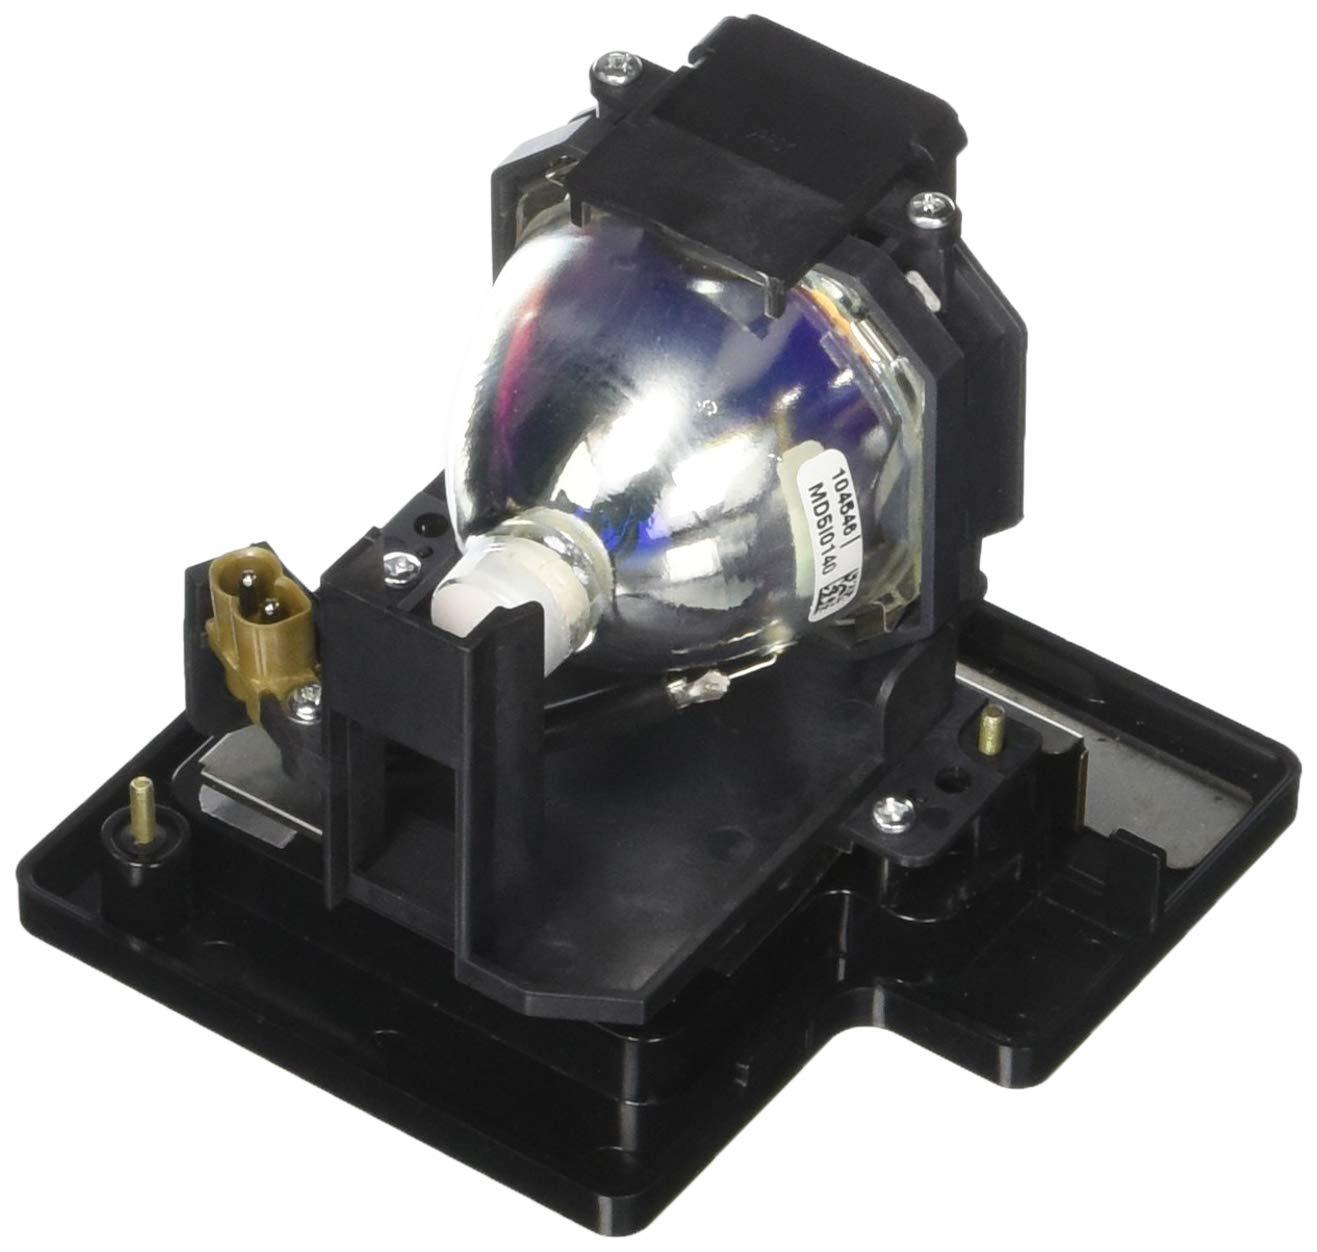 165W Projector Lamp 3000 Hour ETLAE1000 Panasonic ET-LAE1000 Replacement Lamp UHM